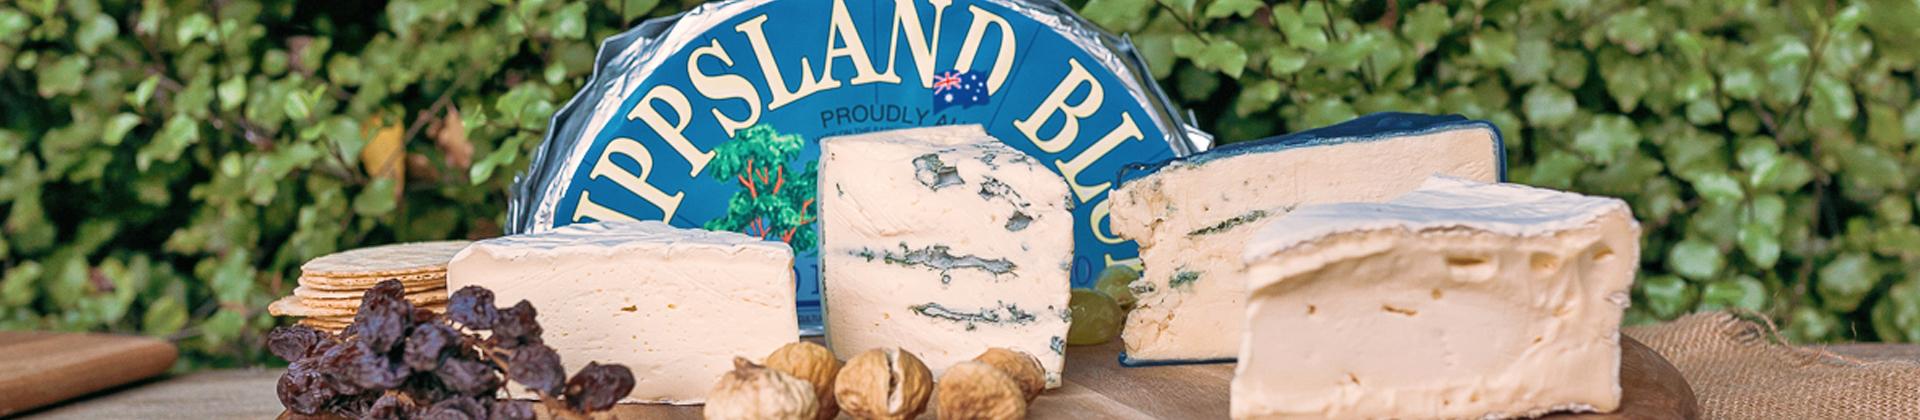 7a-gippsland-cheese-hero